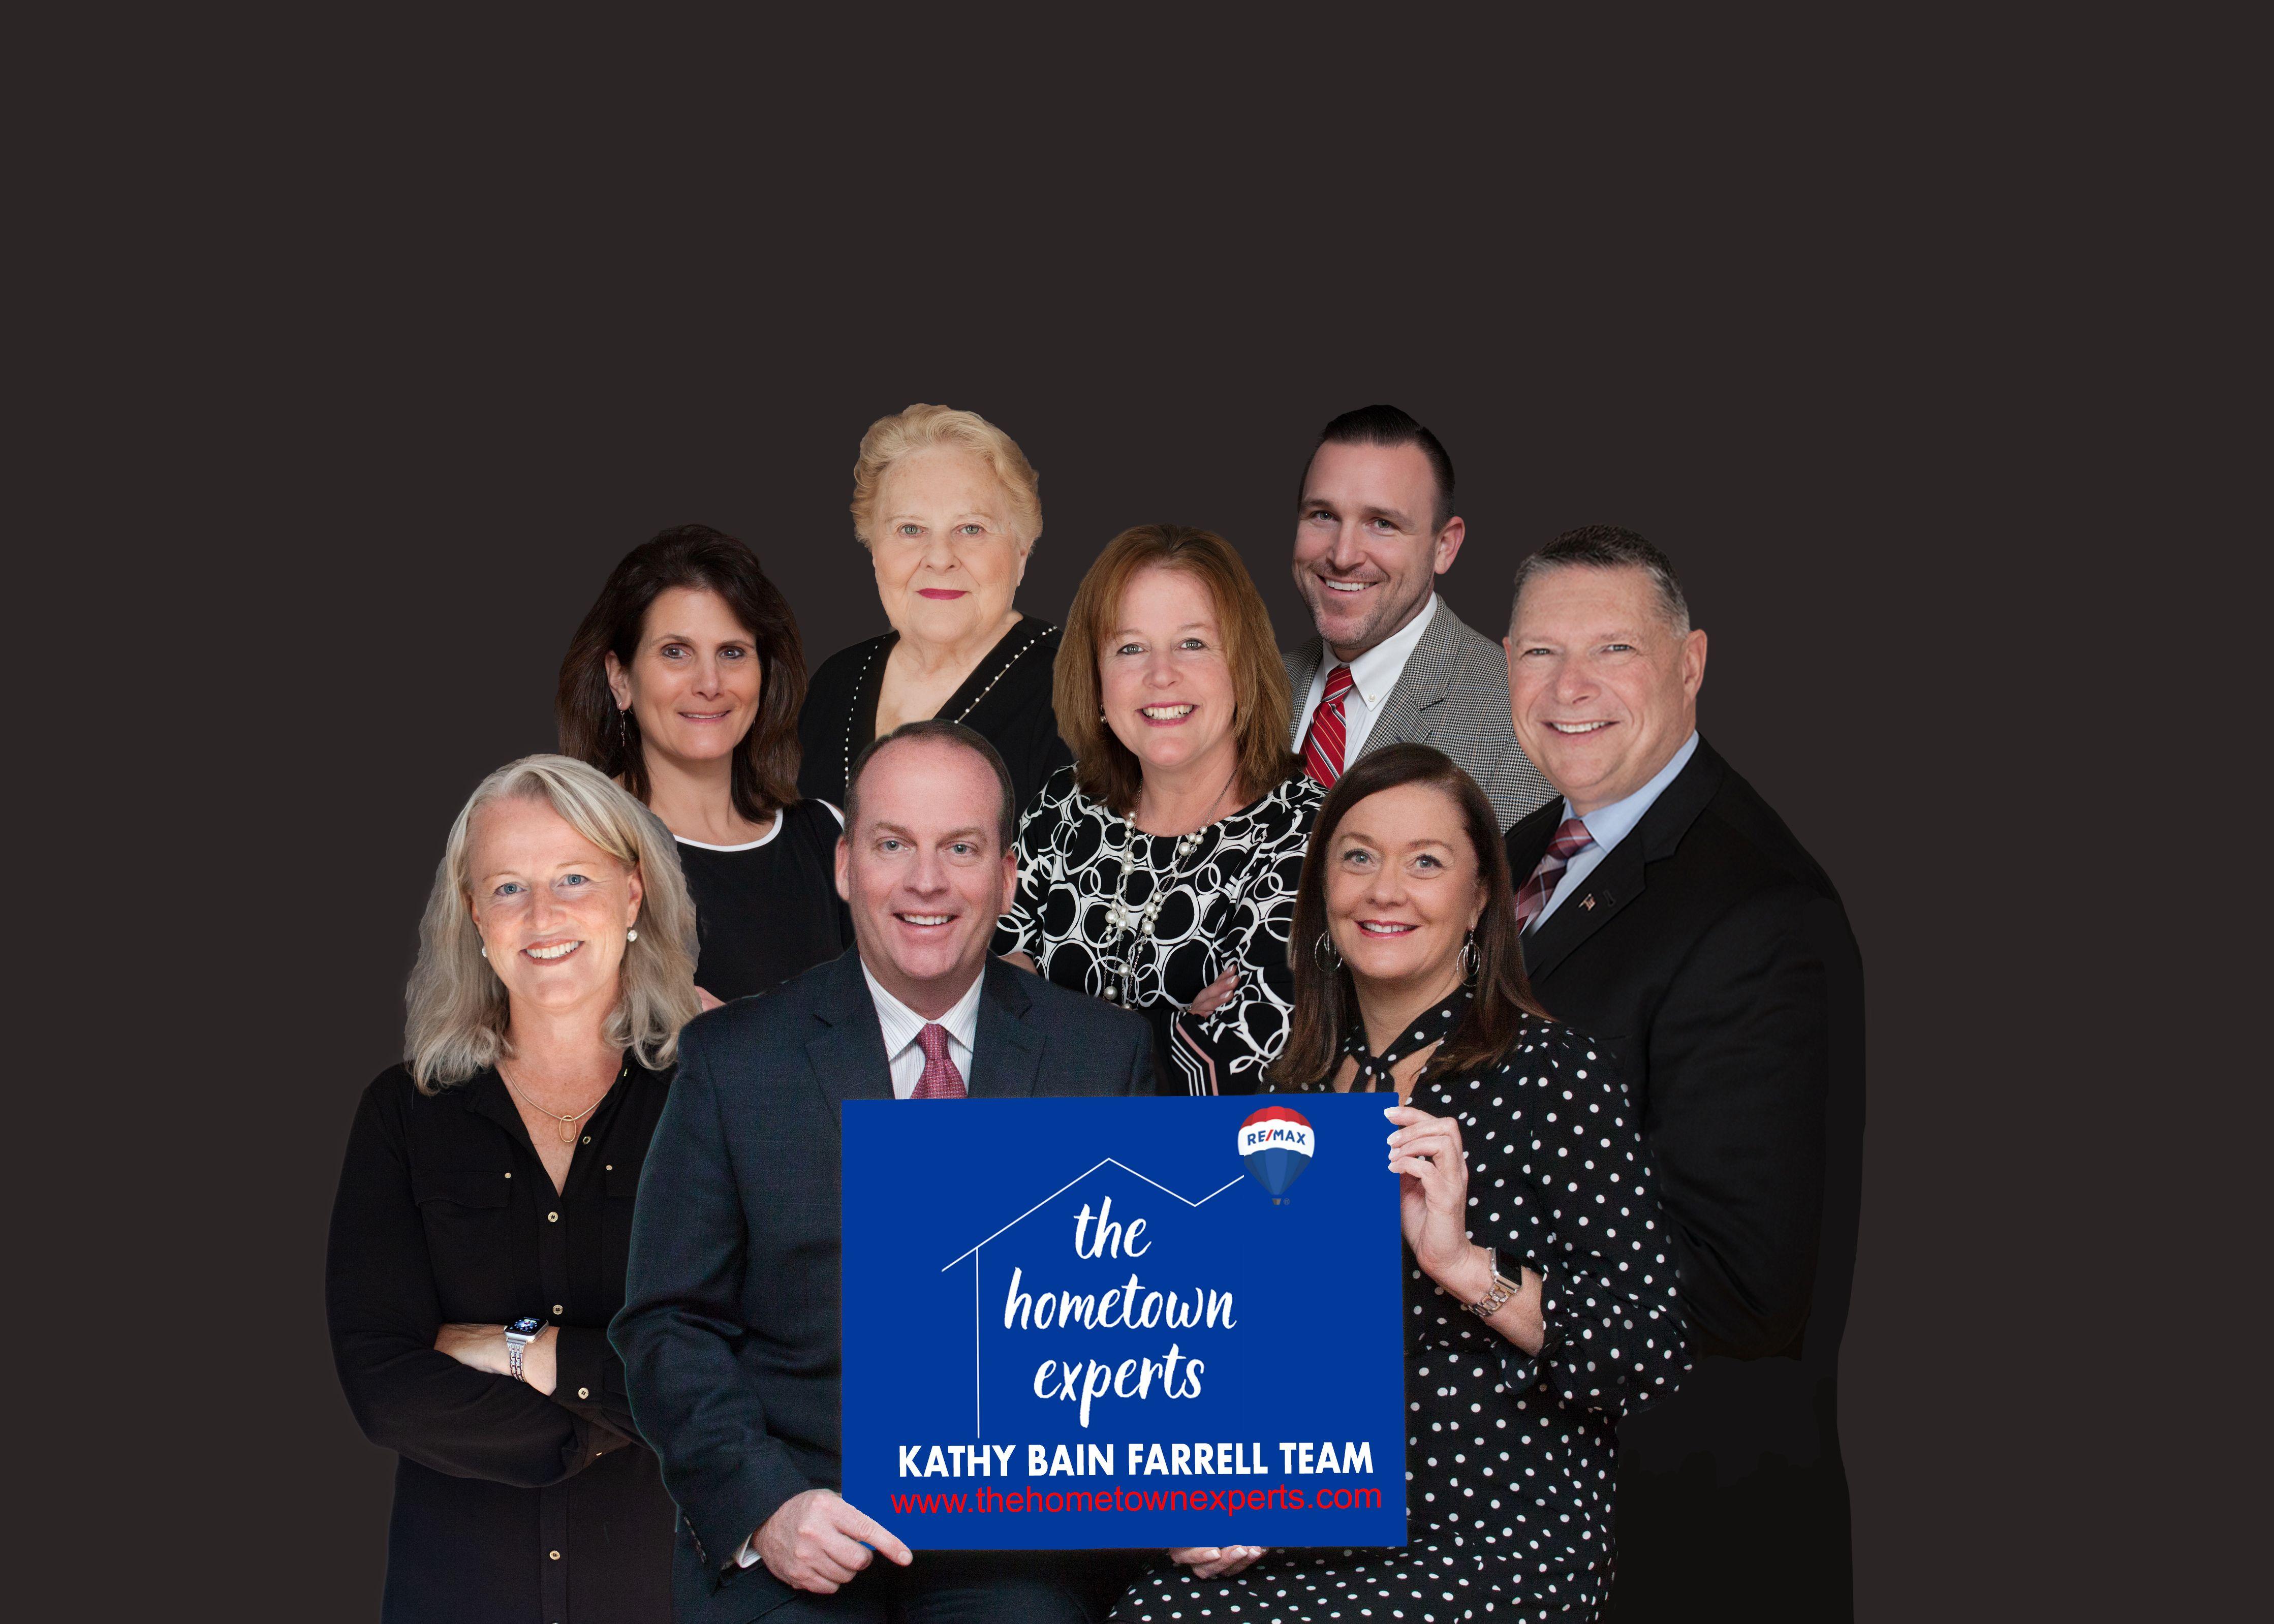 Kathy Bain Farrell Hometown Experts Team